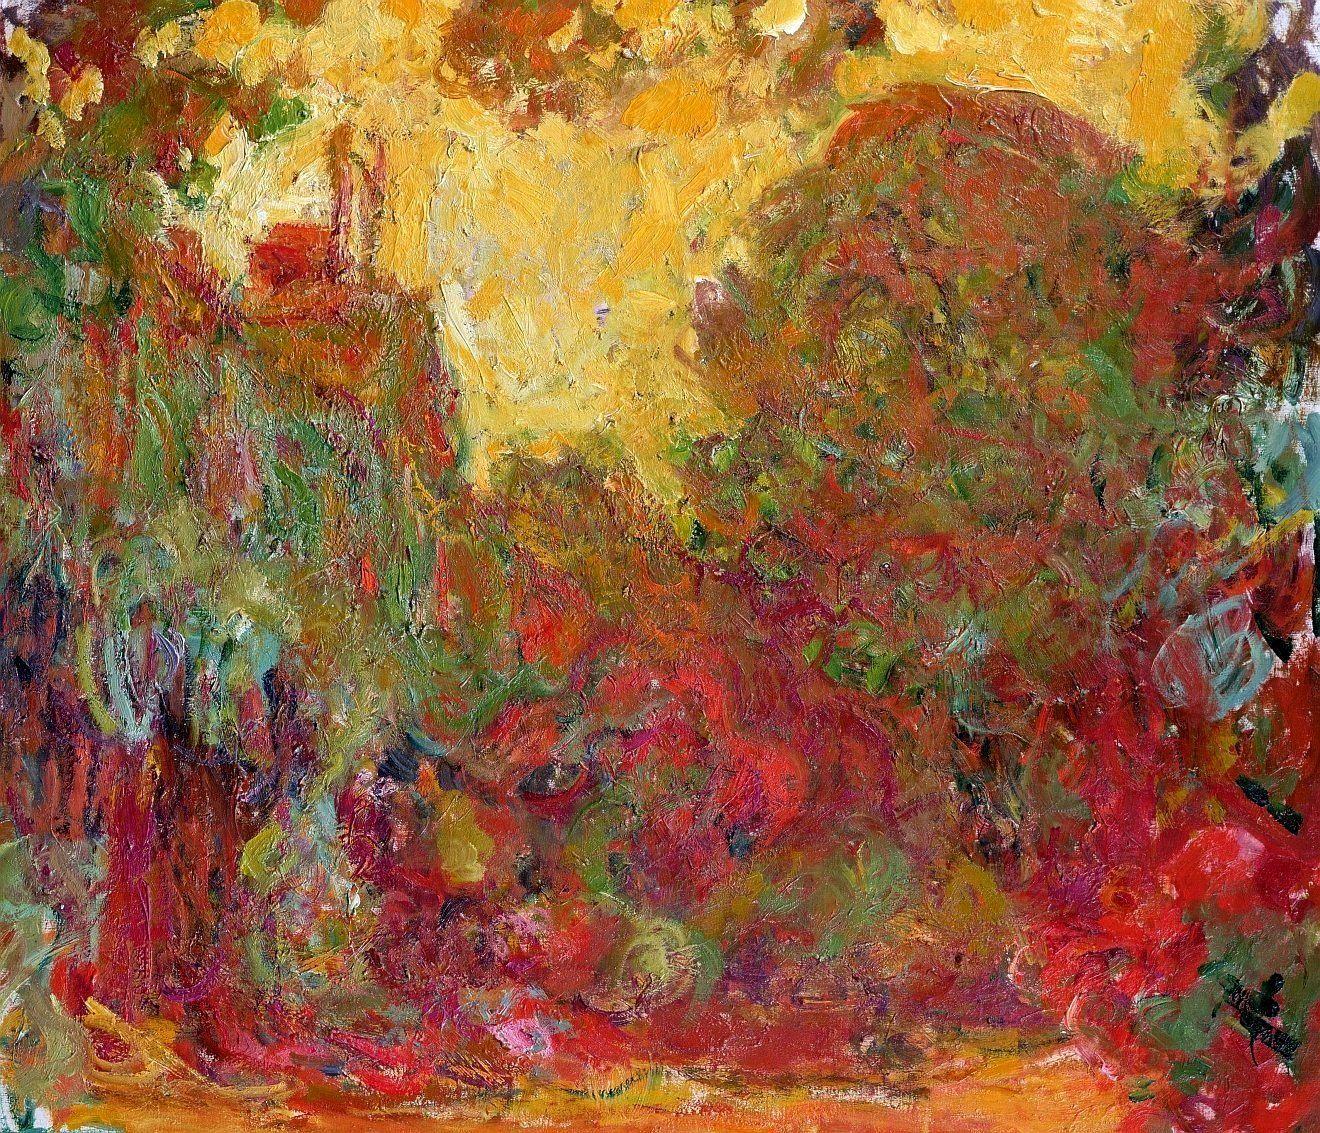 пейзаж < Вид на дом из розалия >:: Клод Моне, описание картины - Моне Клод (Claude Monet) фото